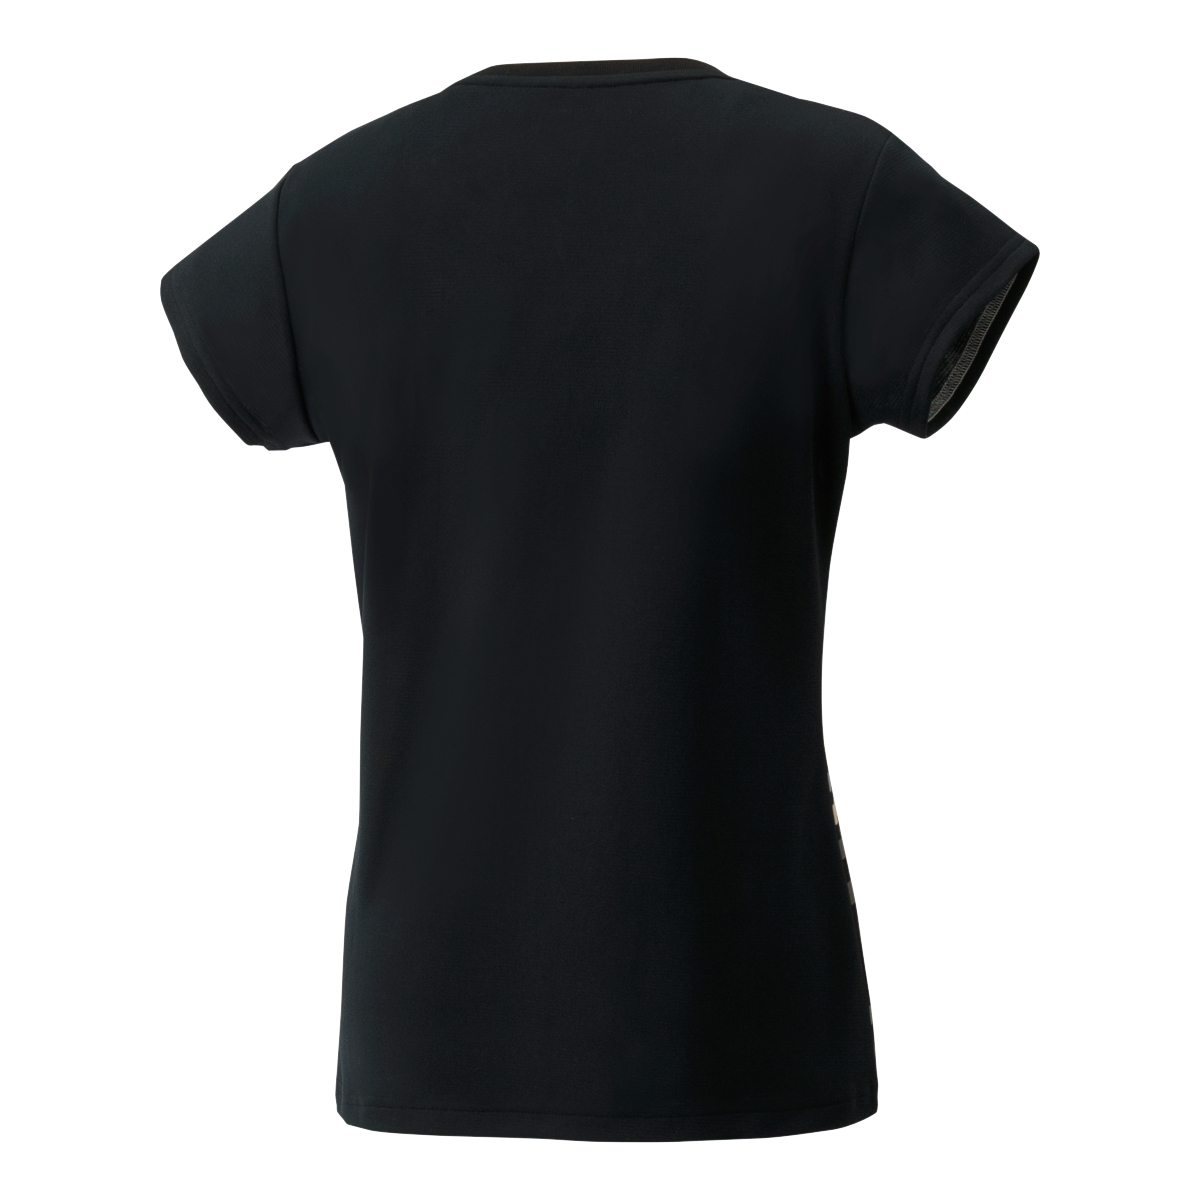 Women's Crew Neck ShirtDetailbild - 4